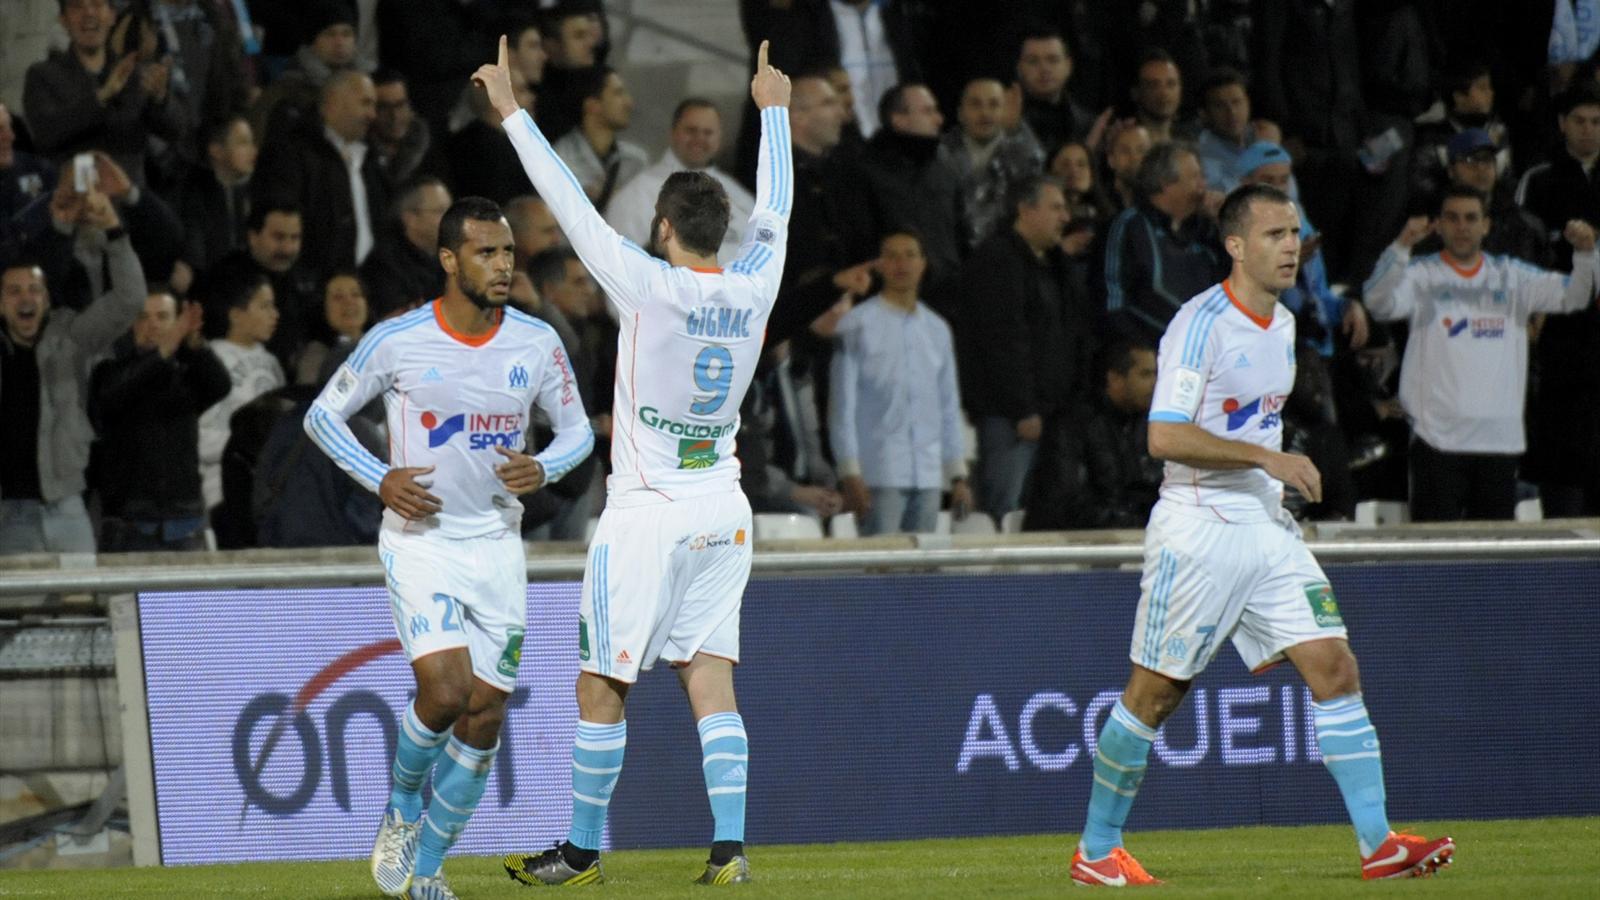 Match Olympique de Marseille (OM) vs Girondins de Bordeaux en direct live streaming